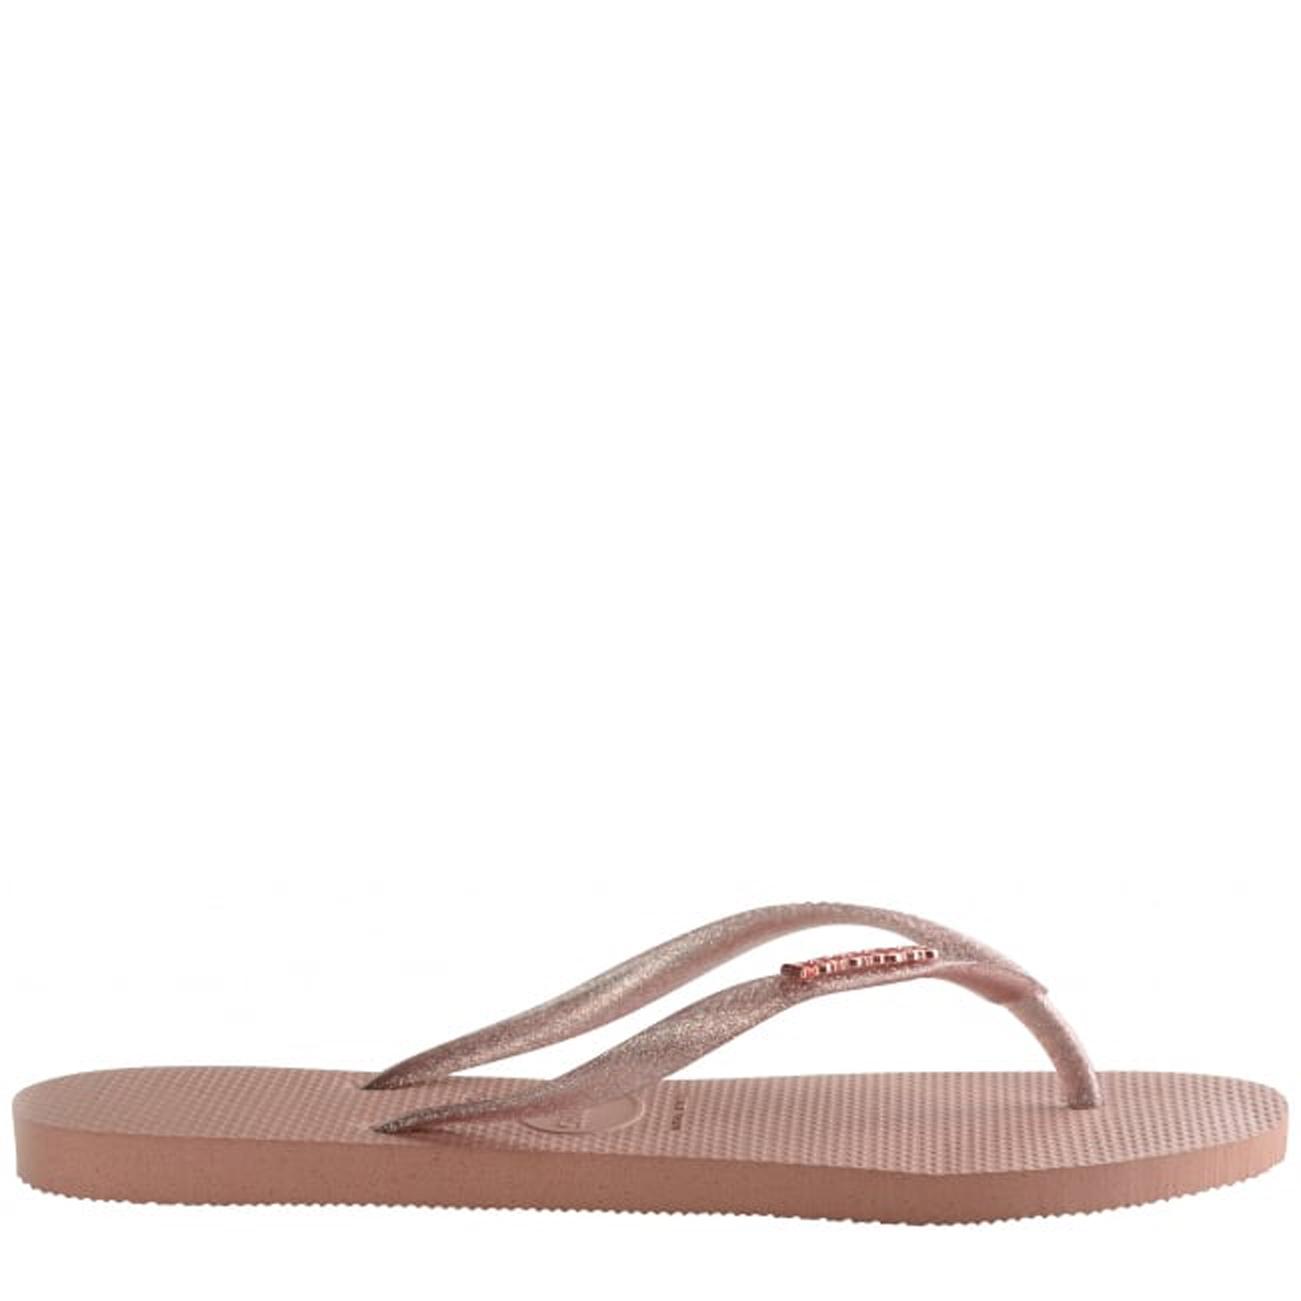 b2777d4273c Ladies Havaianas Slim Logo Metallic Toe Post Thong Beach Summer Sandal All  Sizes